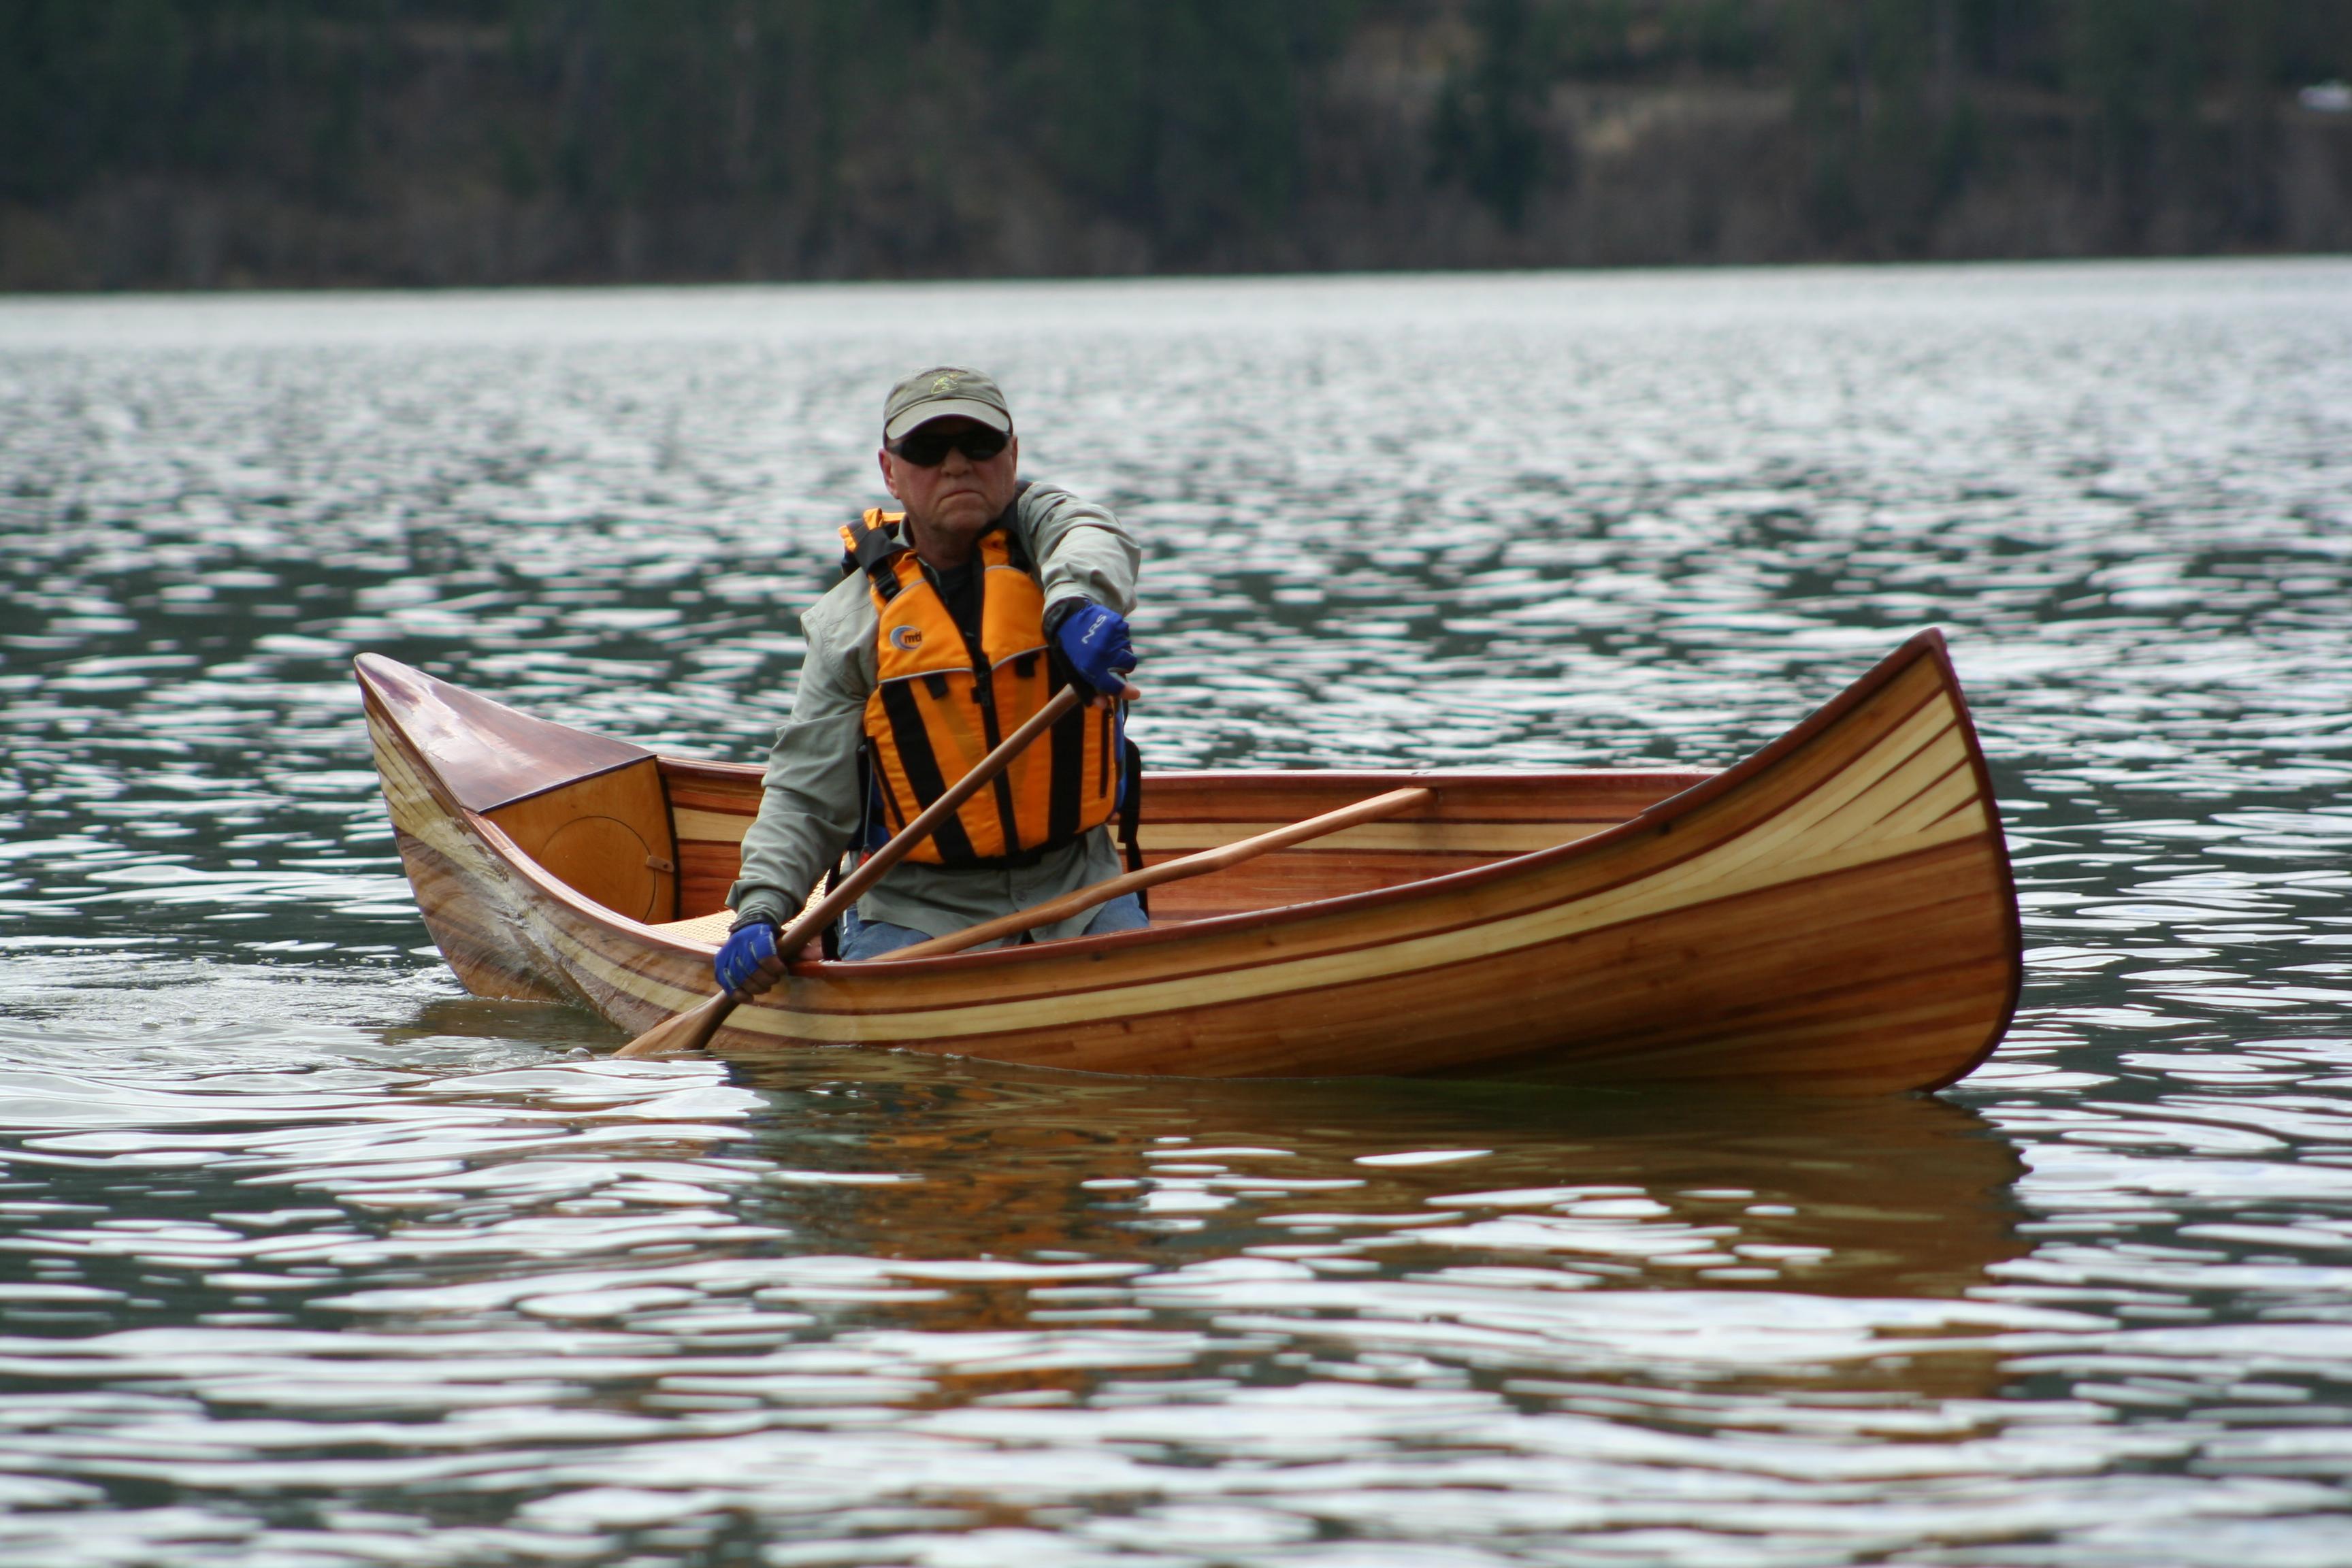 Wood Strip Gallery | Heirloom Paddle Sports Canoe